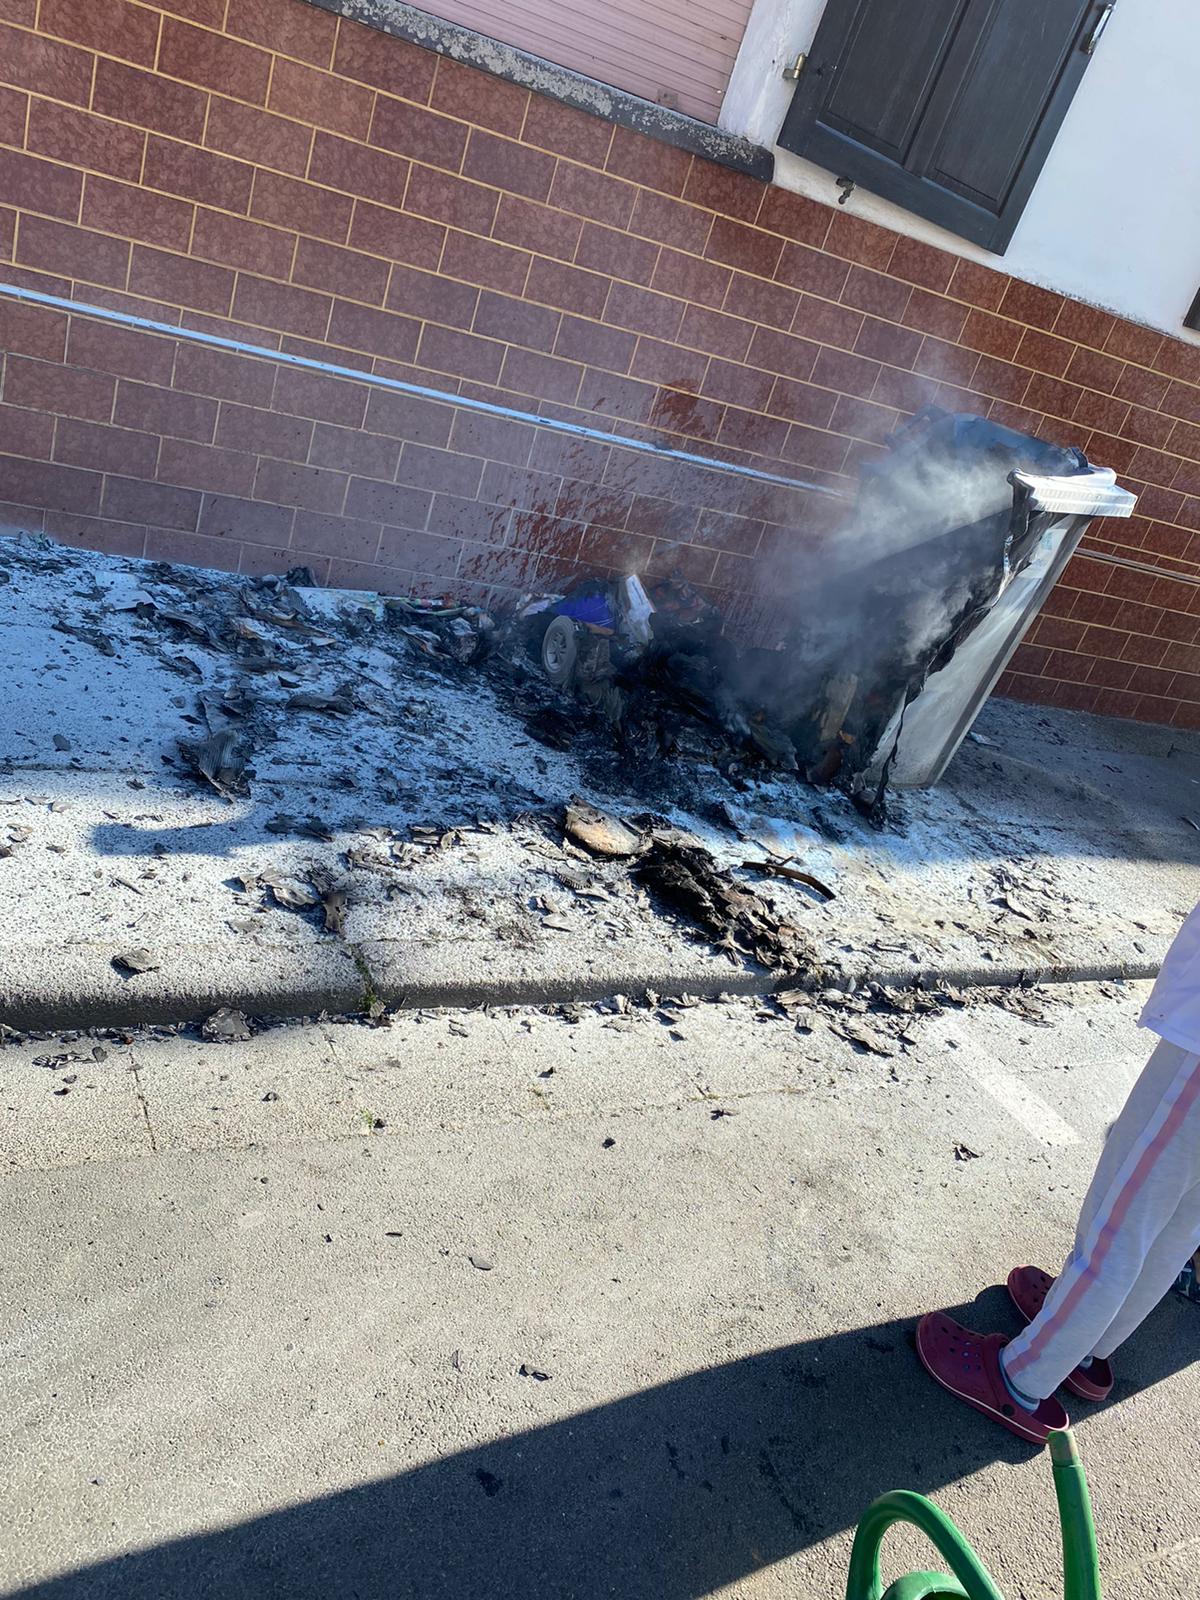 F1 – Brennt Mülltonne